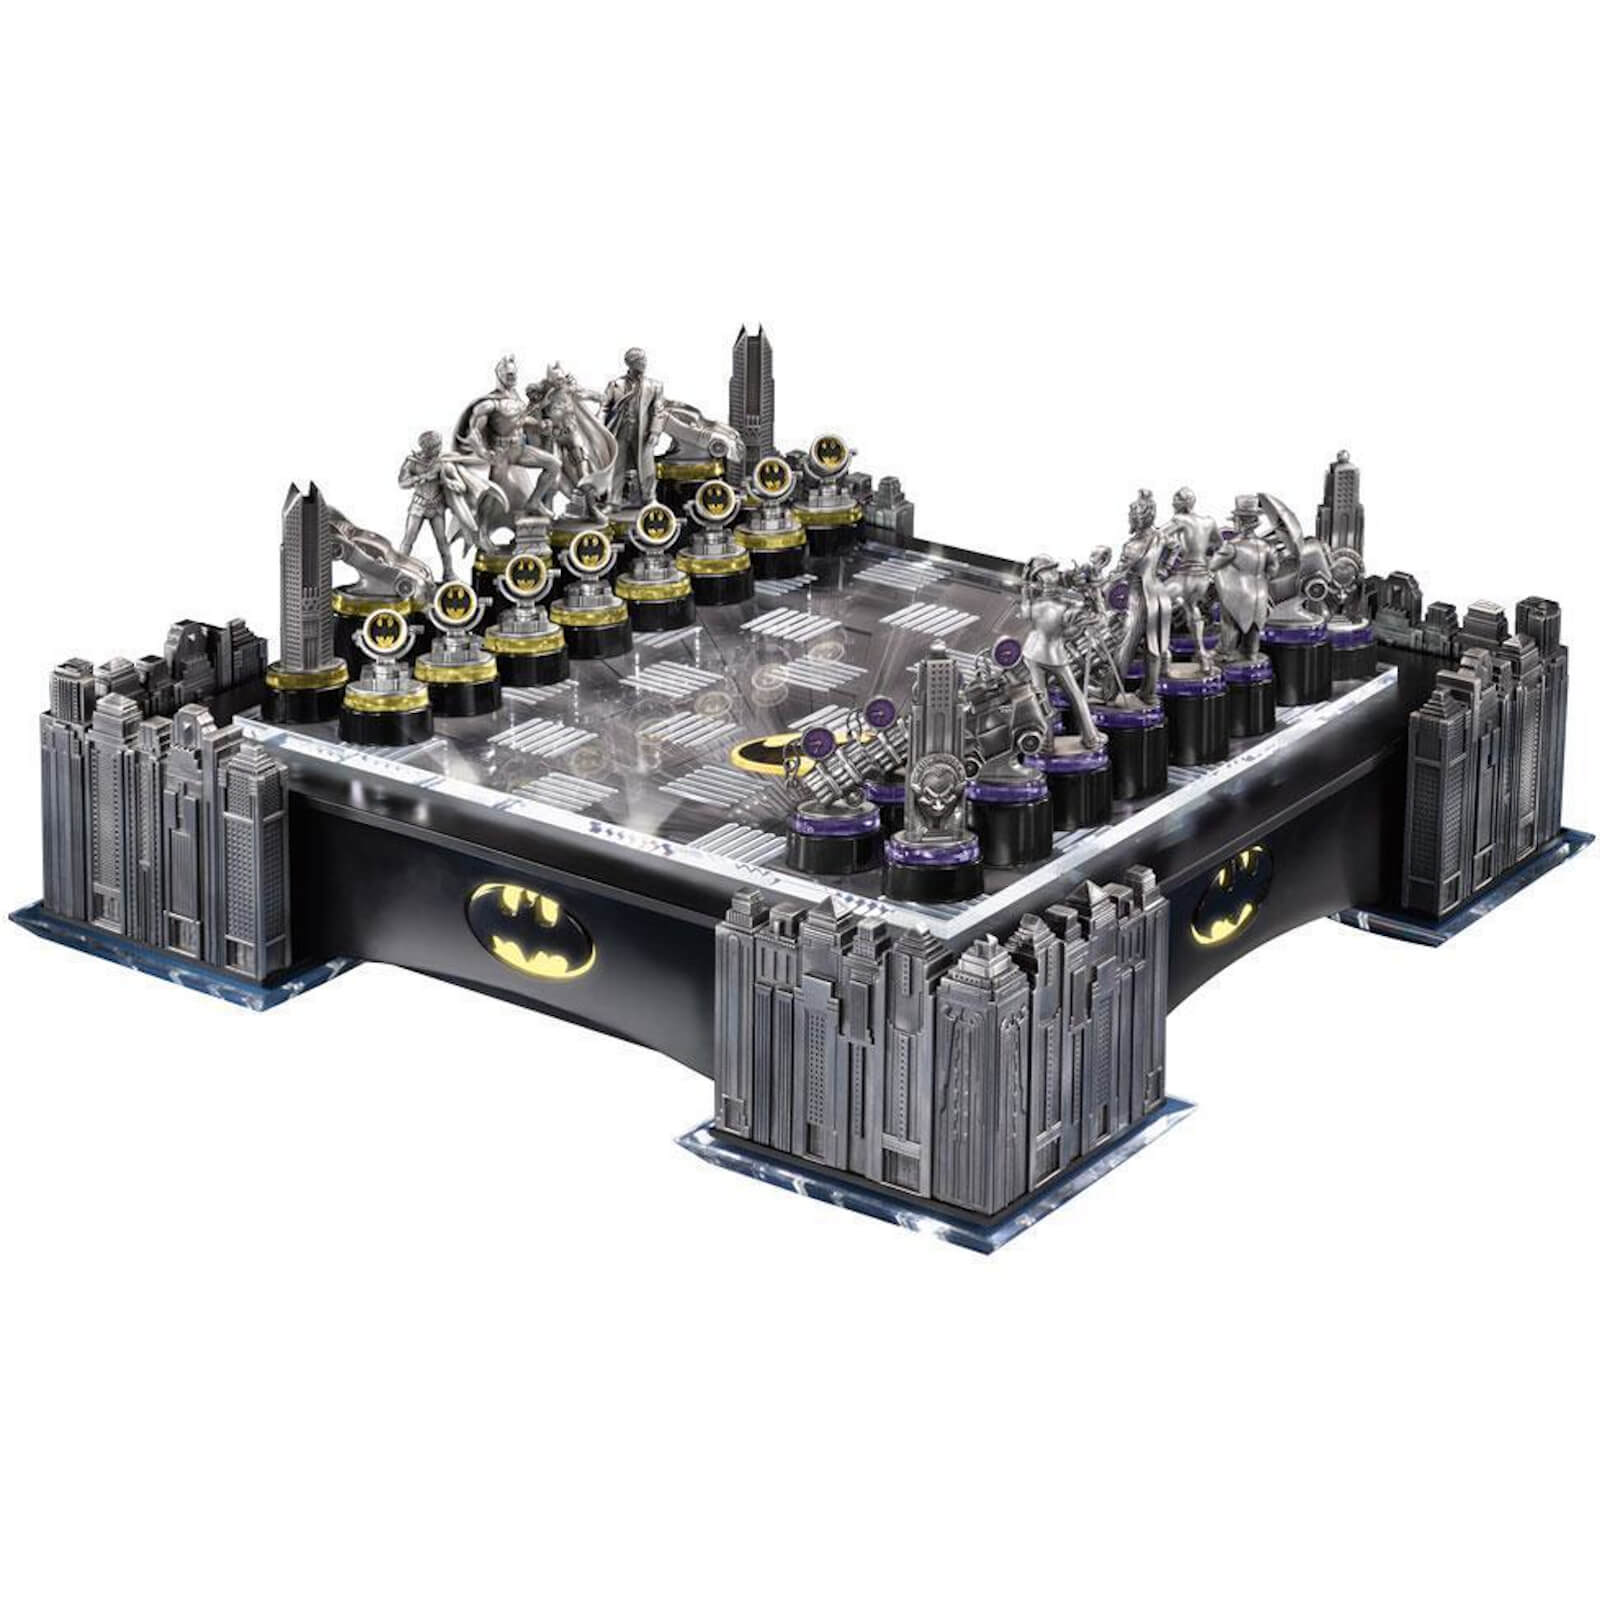 Image of DC Comics Batman Pewter Chess Set with Illuminating Bat Signal